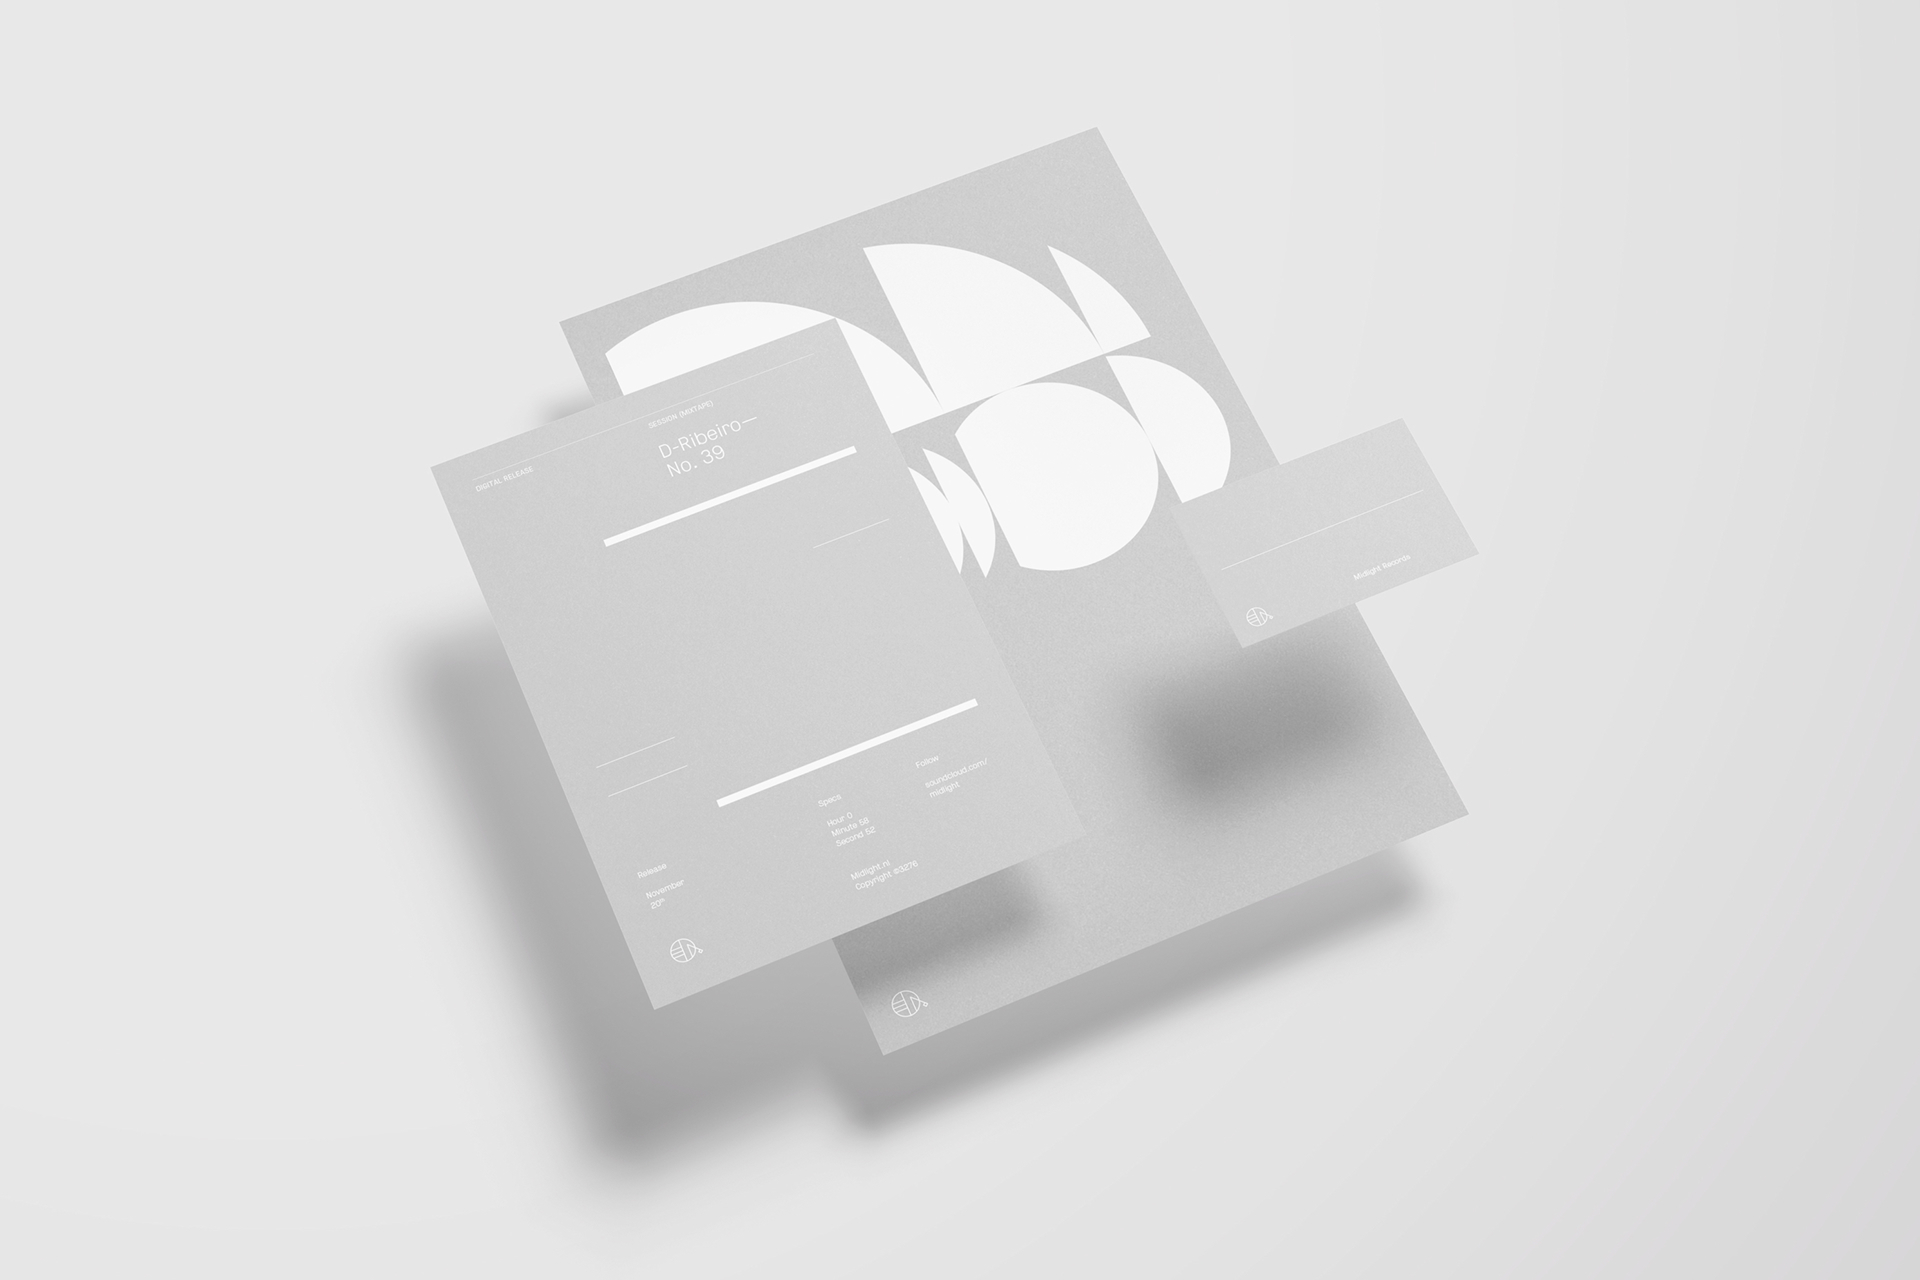 Midlight创意设计 欣赏-第6张